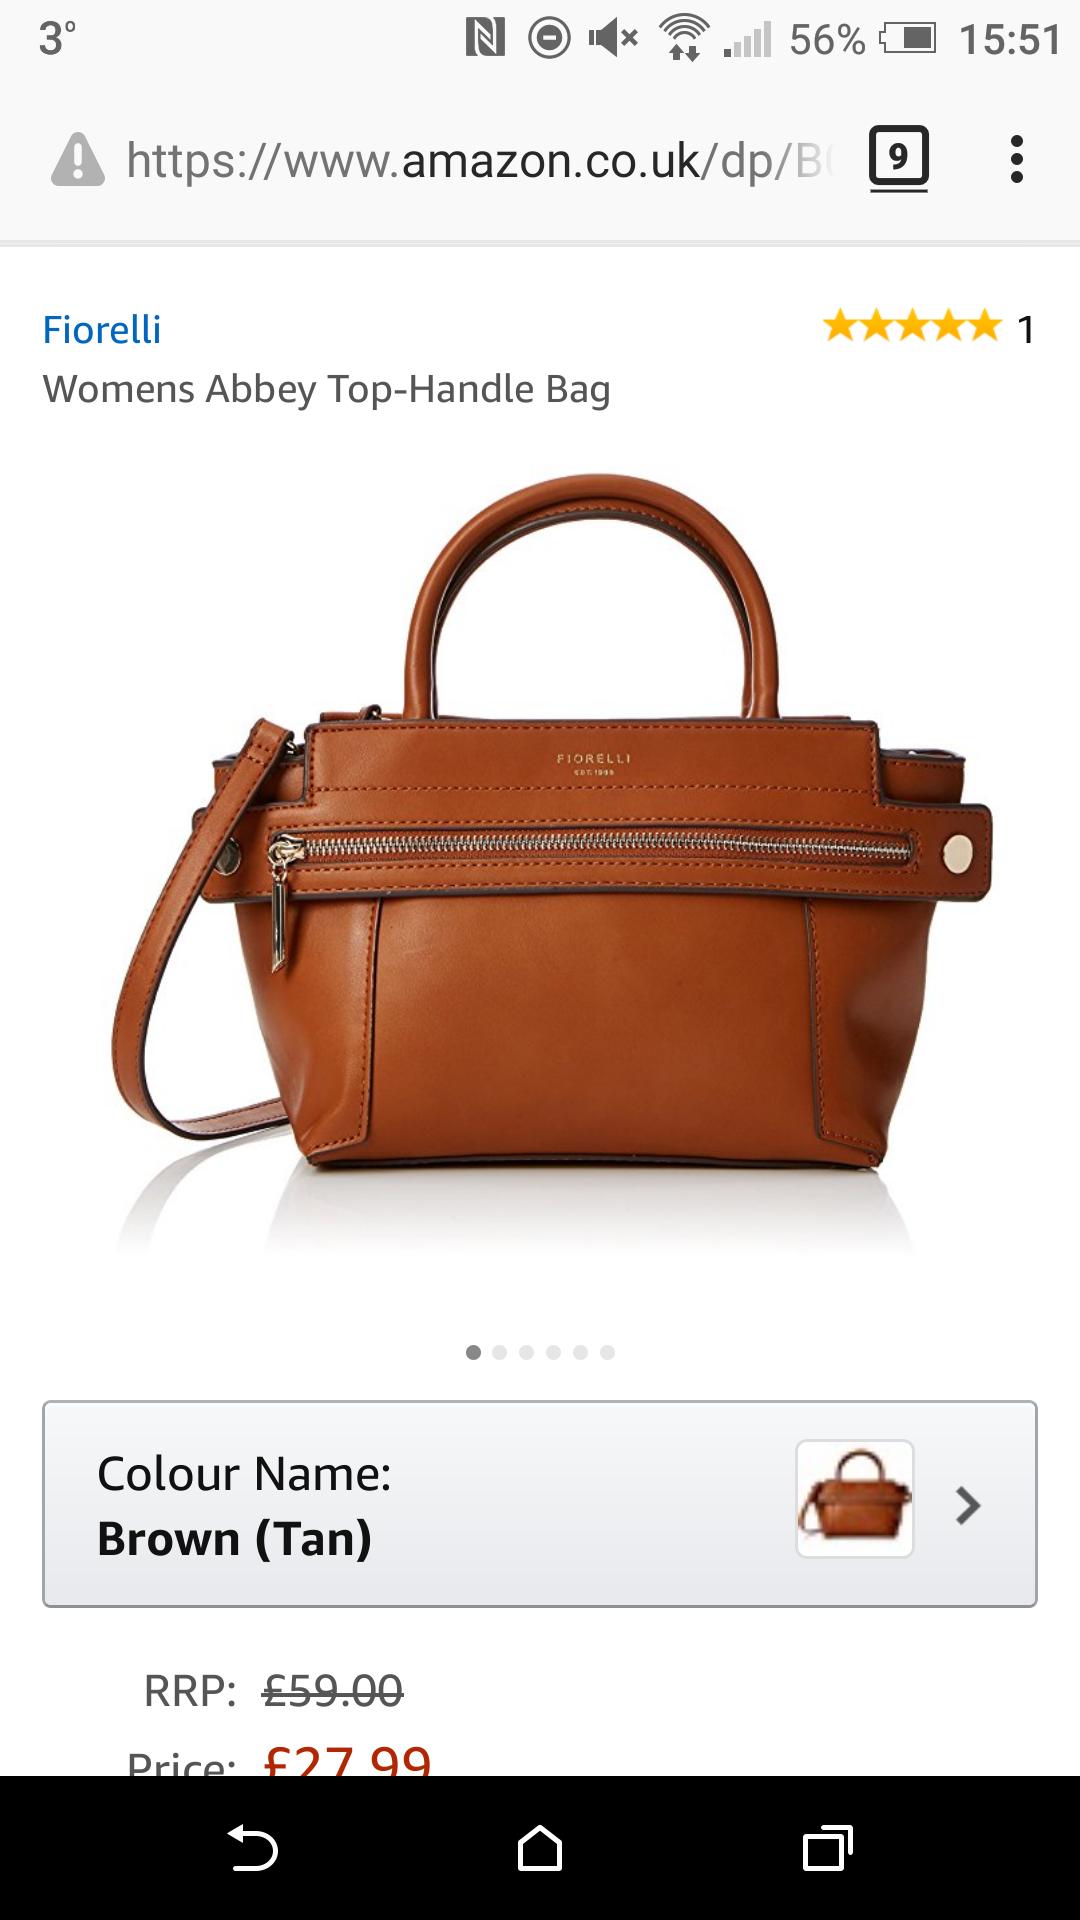 Womens Abbey Top-Handle Bag £27.99 @ Amazon